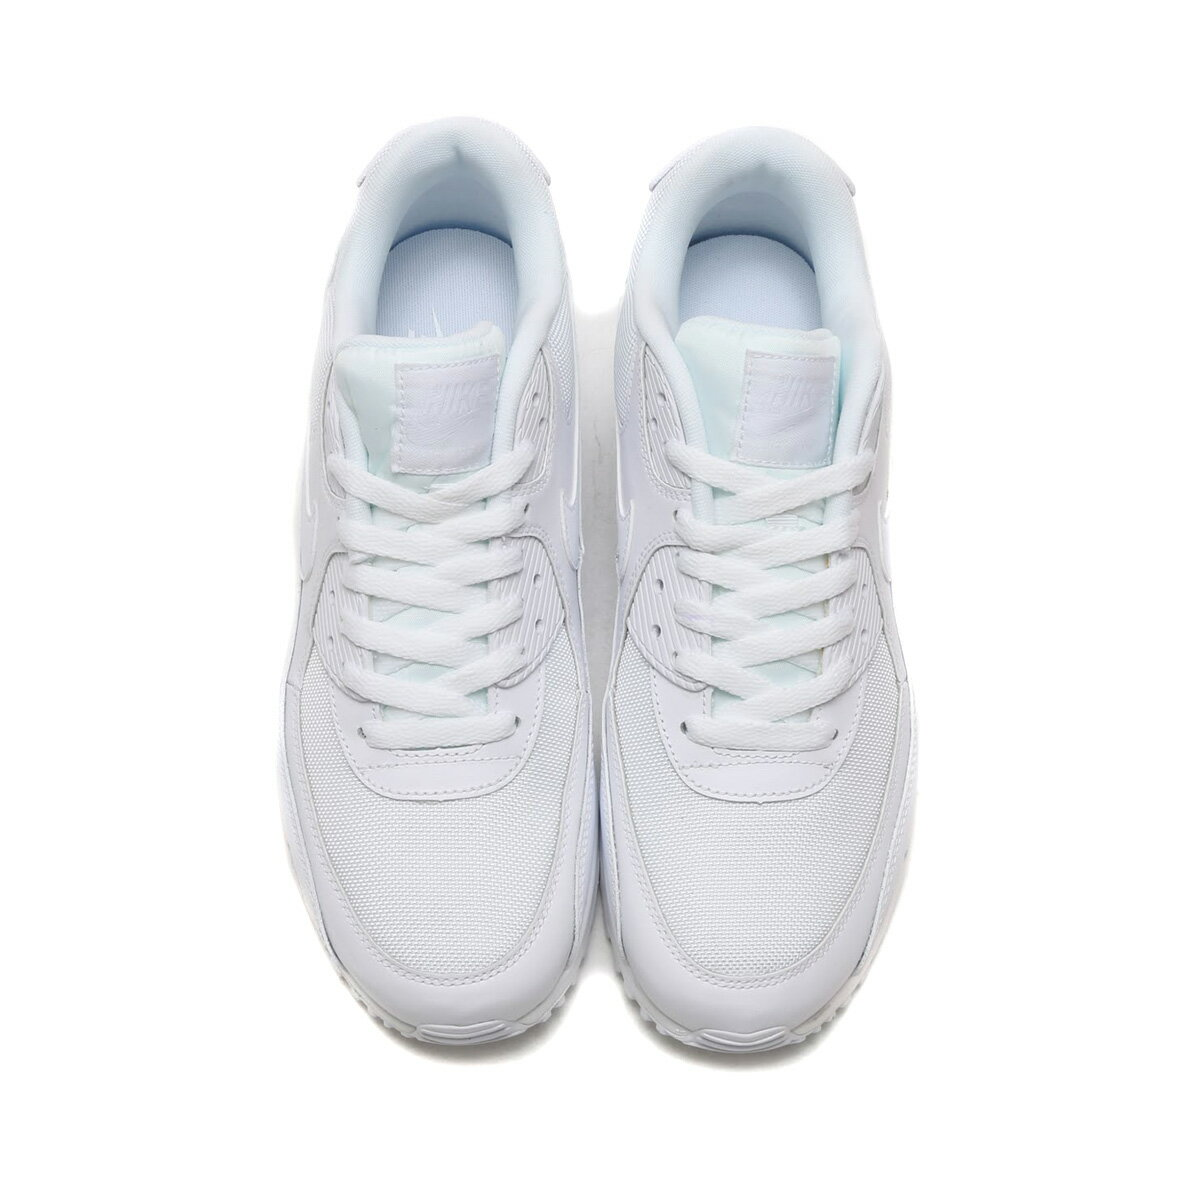 NIKE AIR MAX 90 ESSENTIAL (ナイキ エア マックス 90 エッセンシャル) WHITE/WHITE-WHITE-WHITE-WHITE-WHITE17SP-S